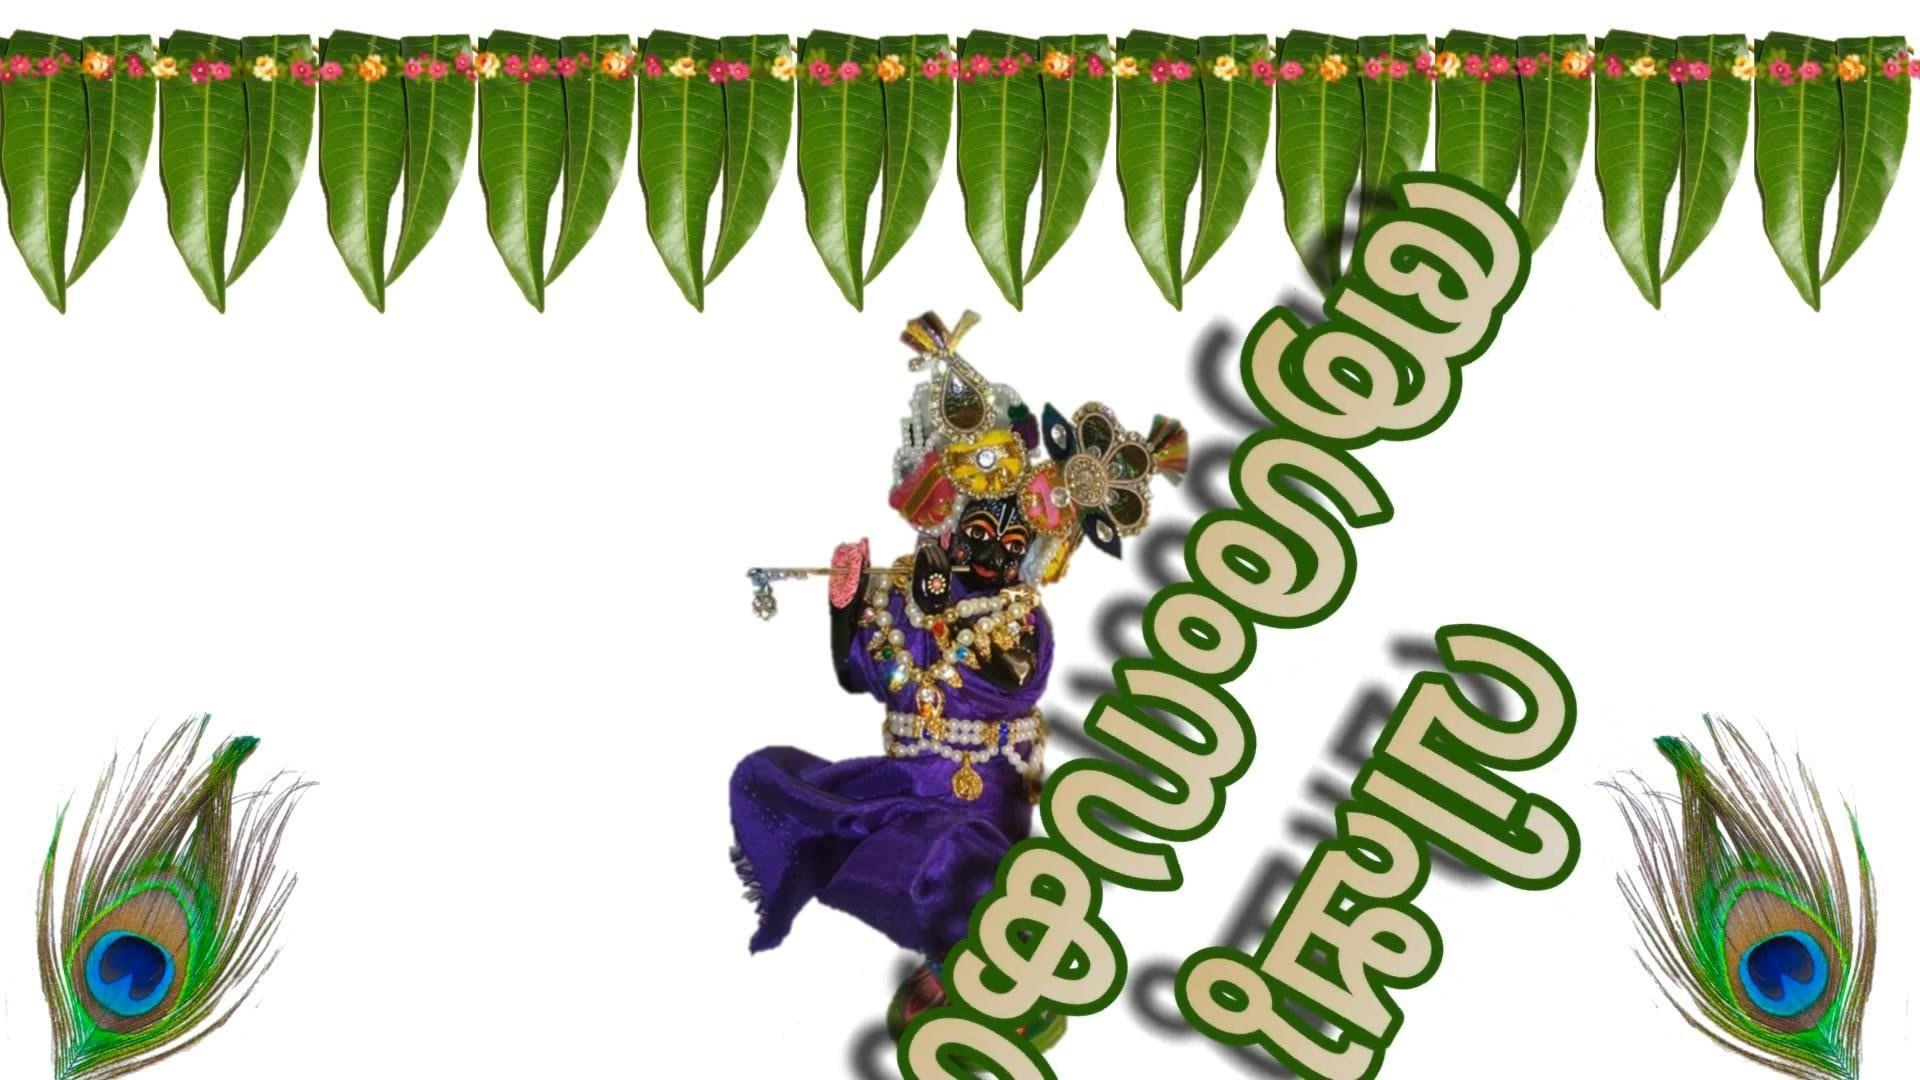 Happy Vishu Greetings Vishu Wishes In Malayalam Vishu Whatsapp